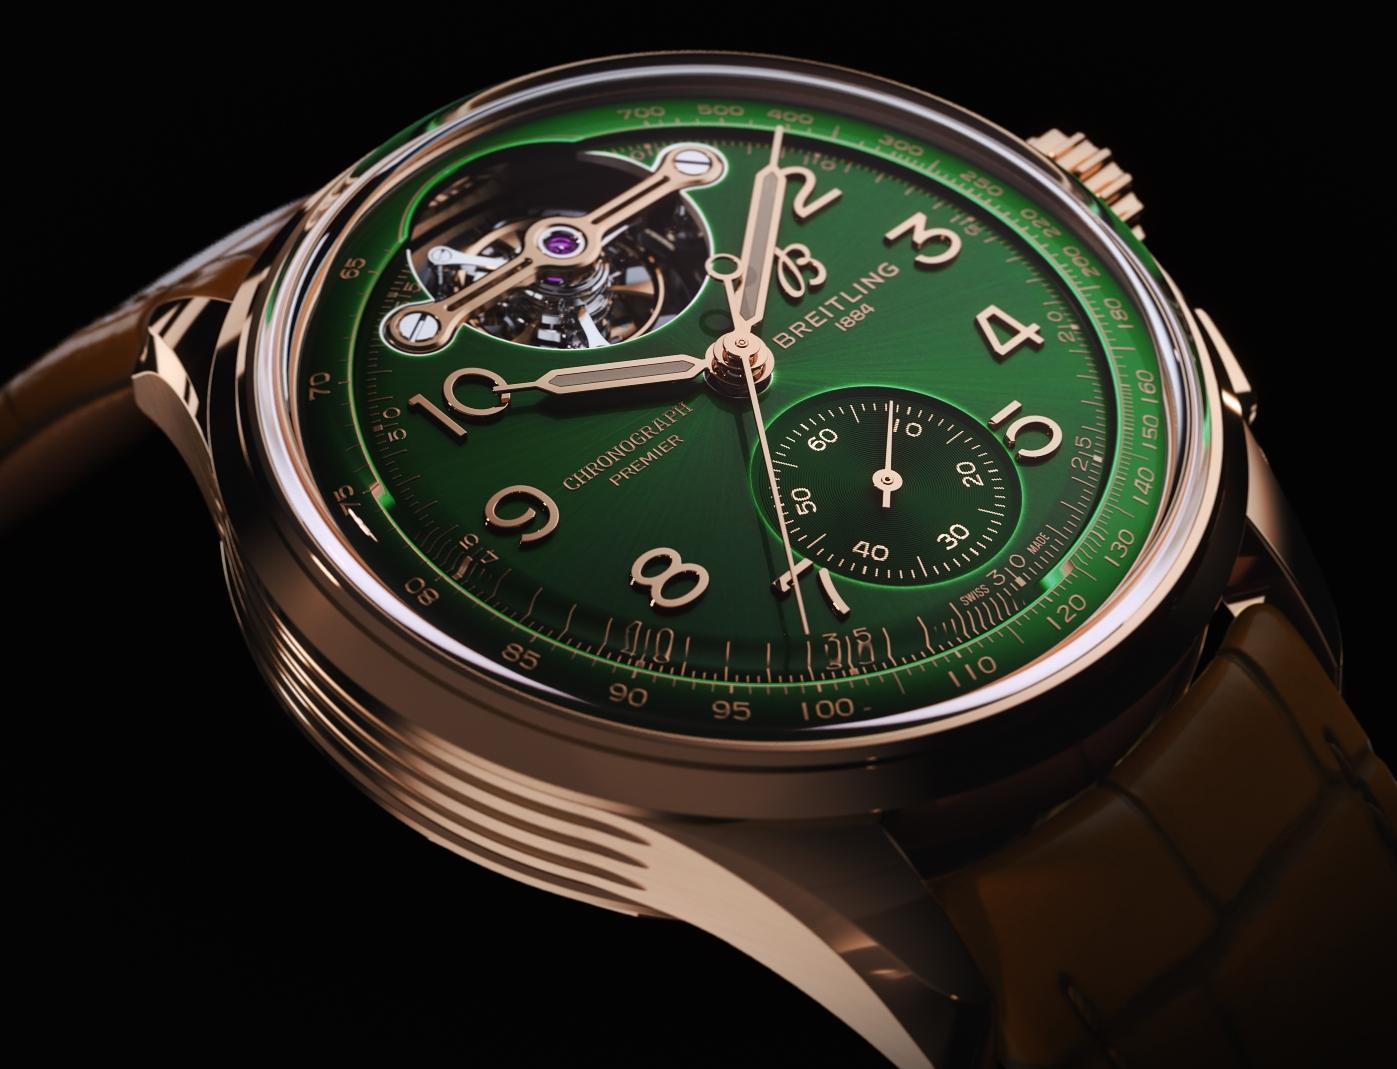 Premier B21 Chronograph Tourbillon 42 Bentley Limited Edition 5 1